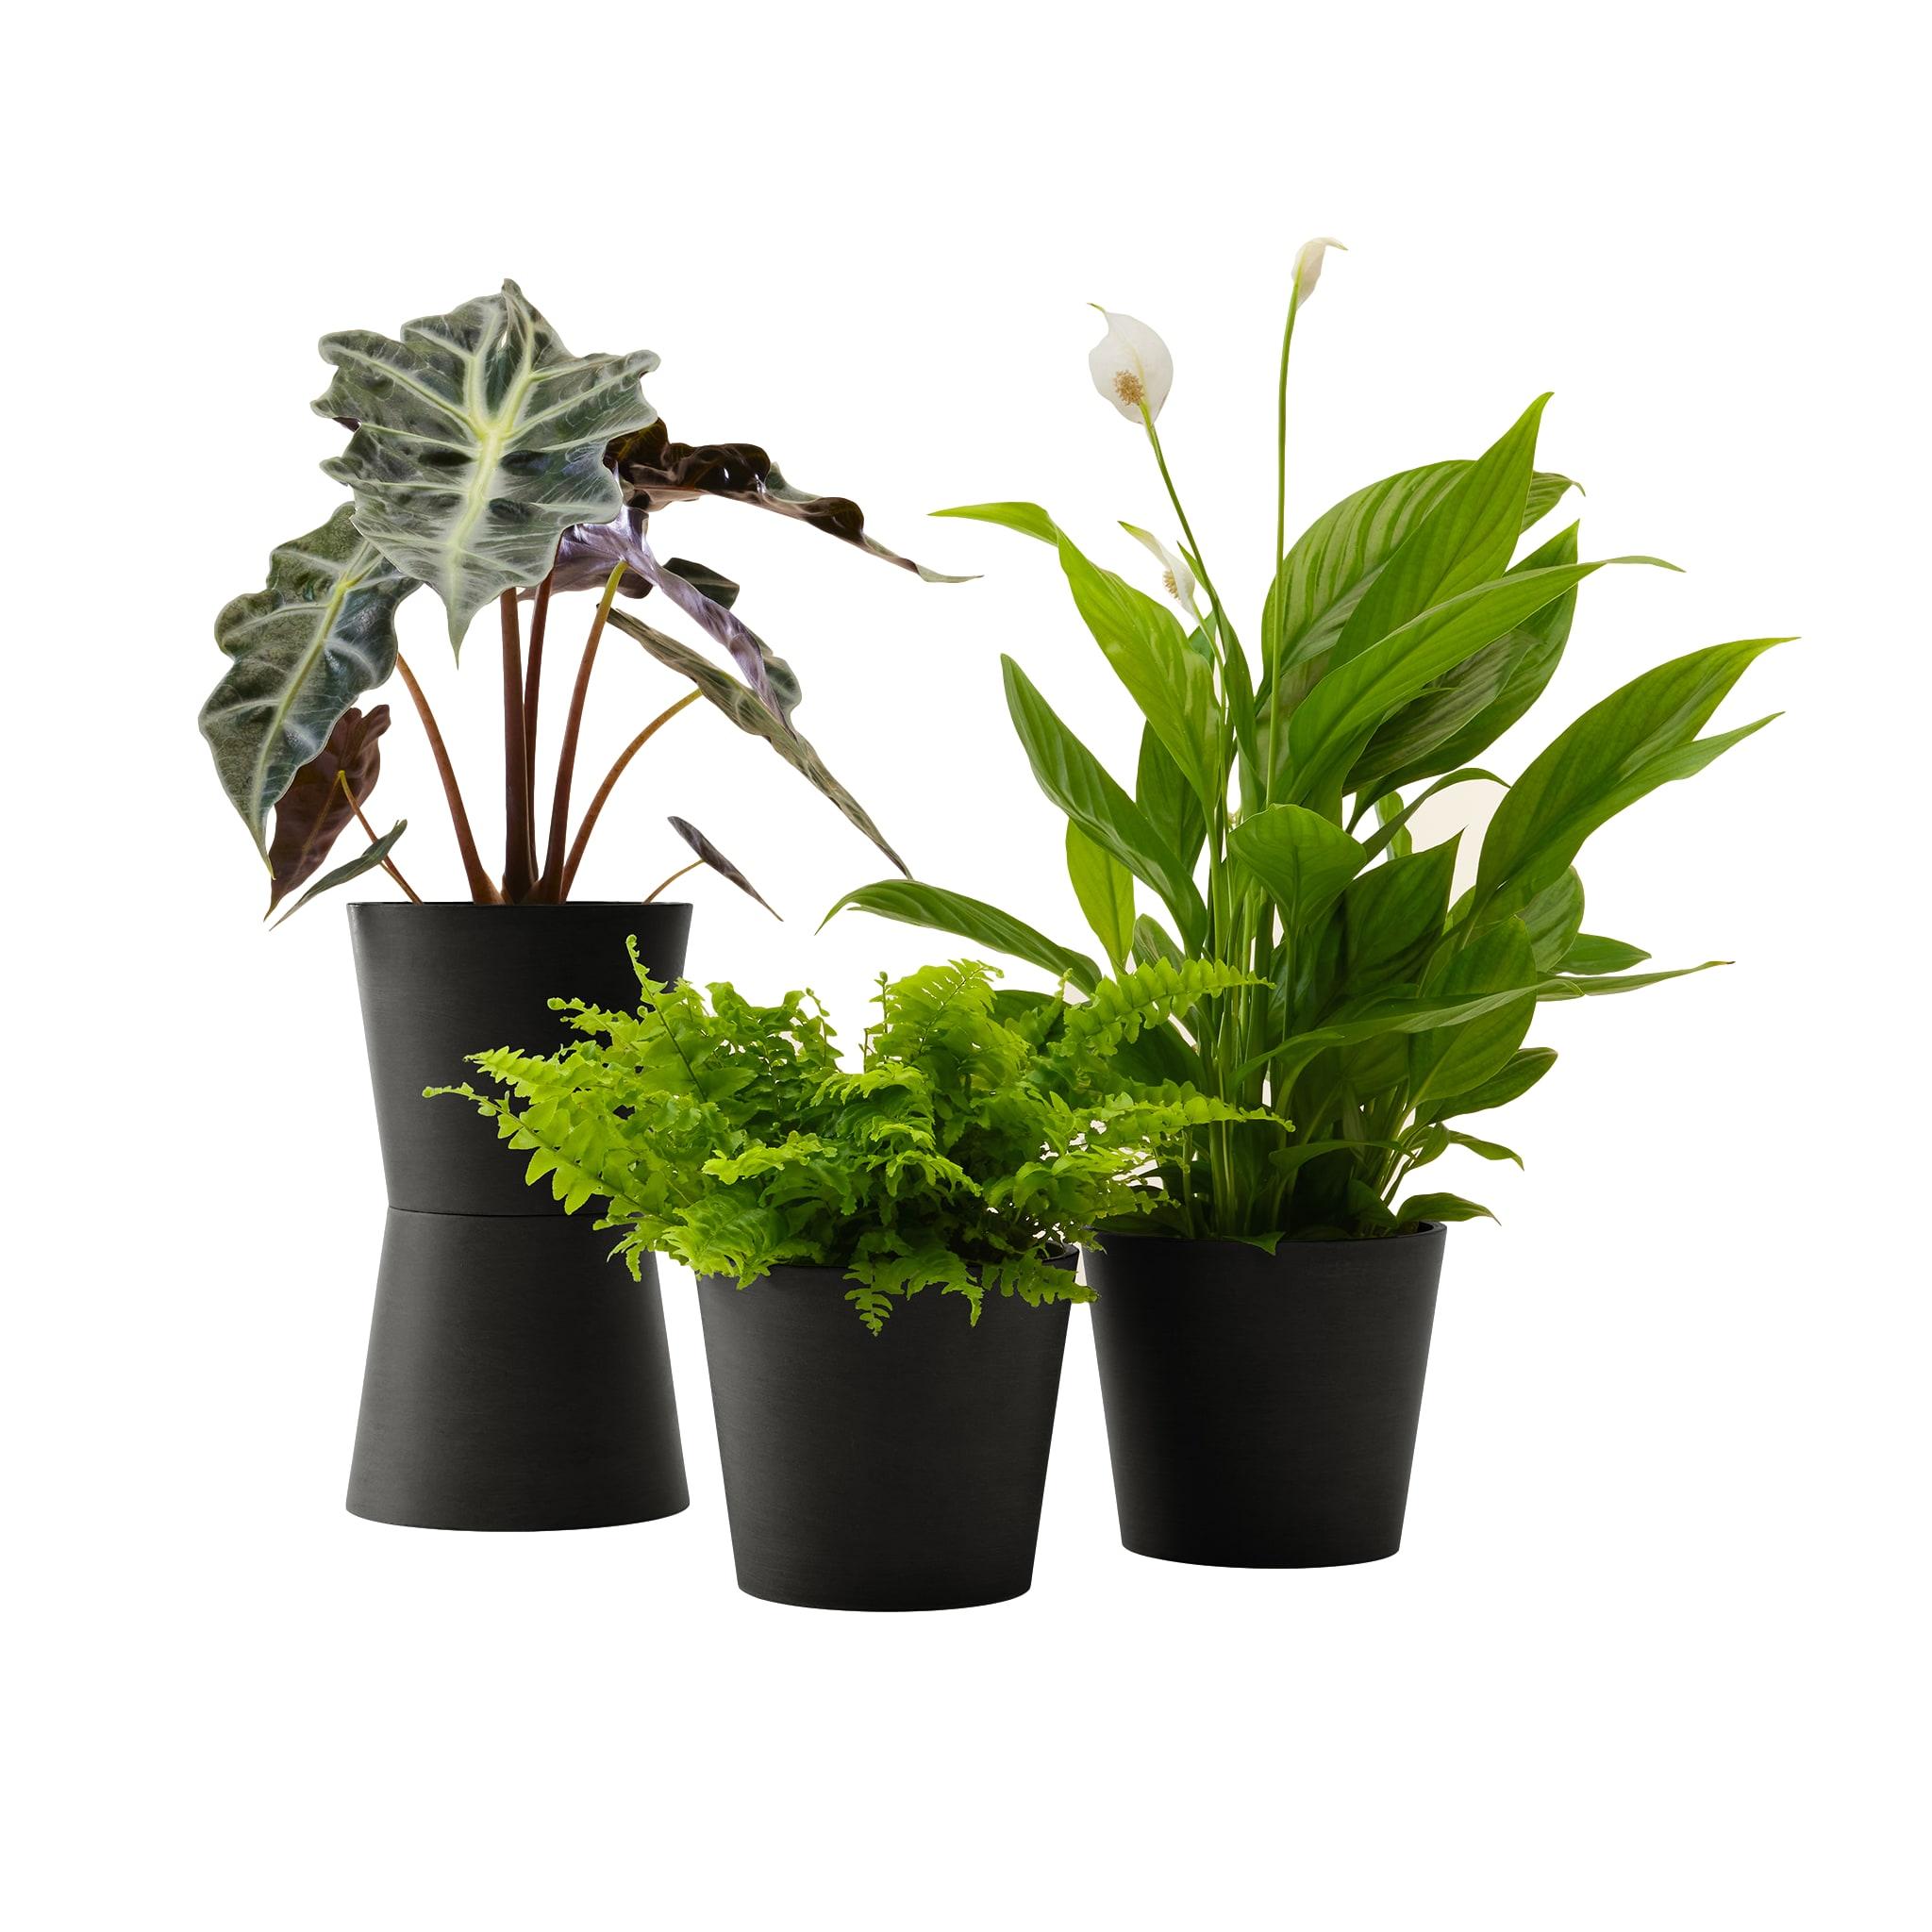 Plante - Spathiphyllum, Bananier, Nephrolepis pot noir